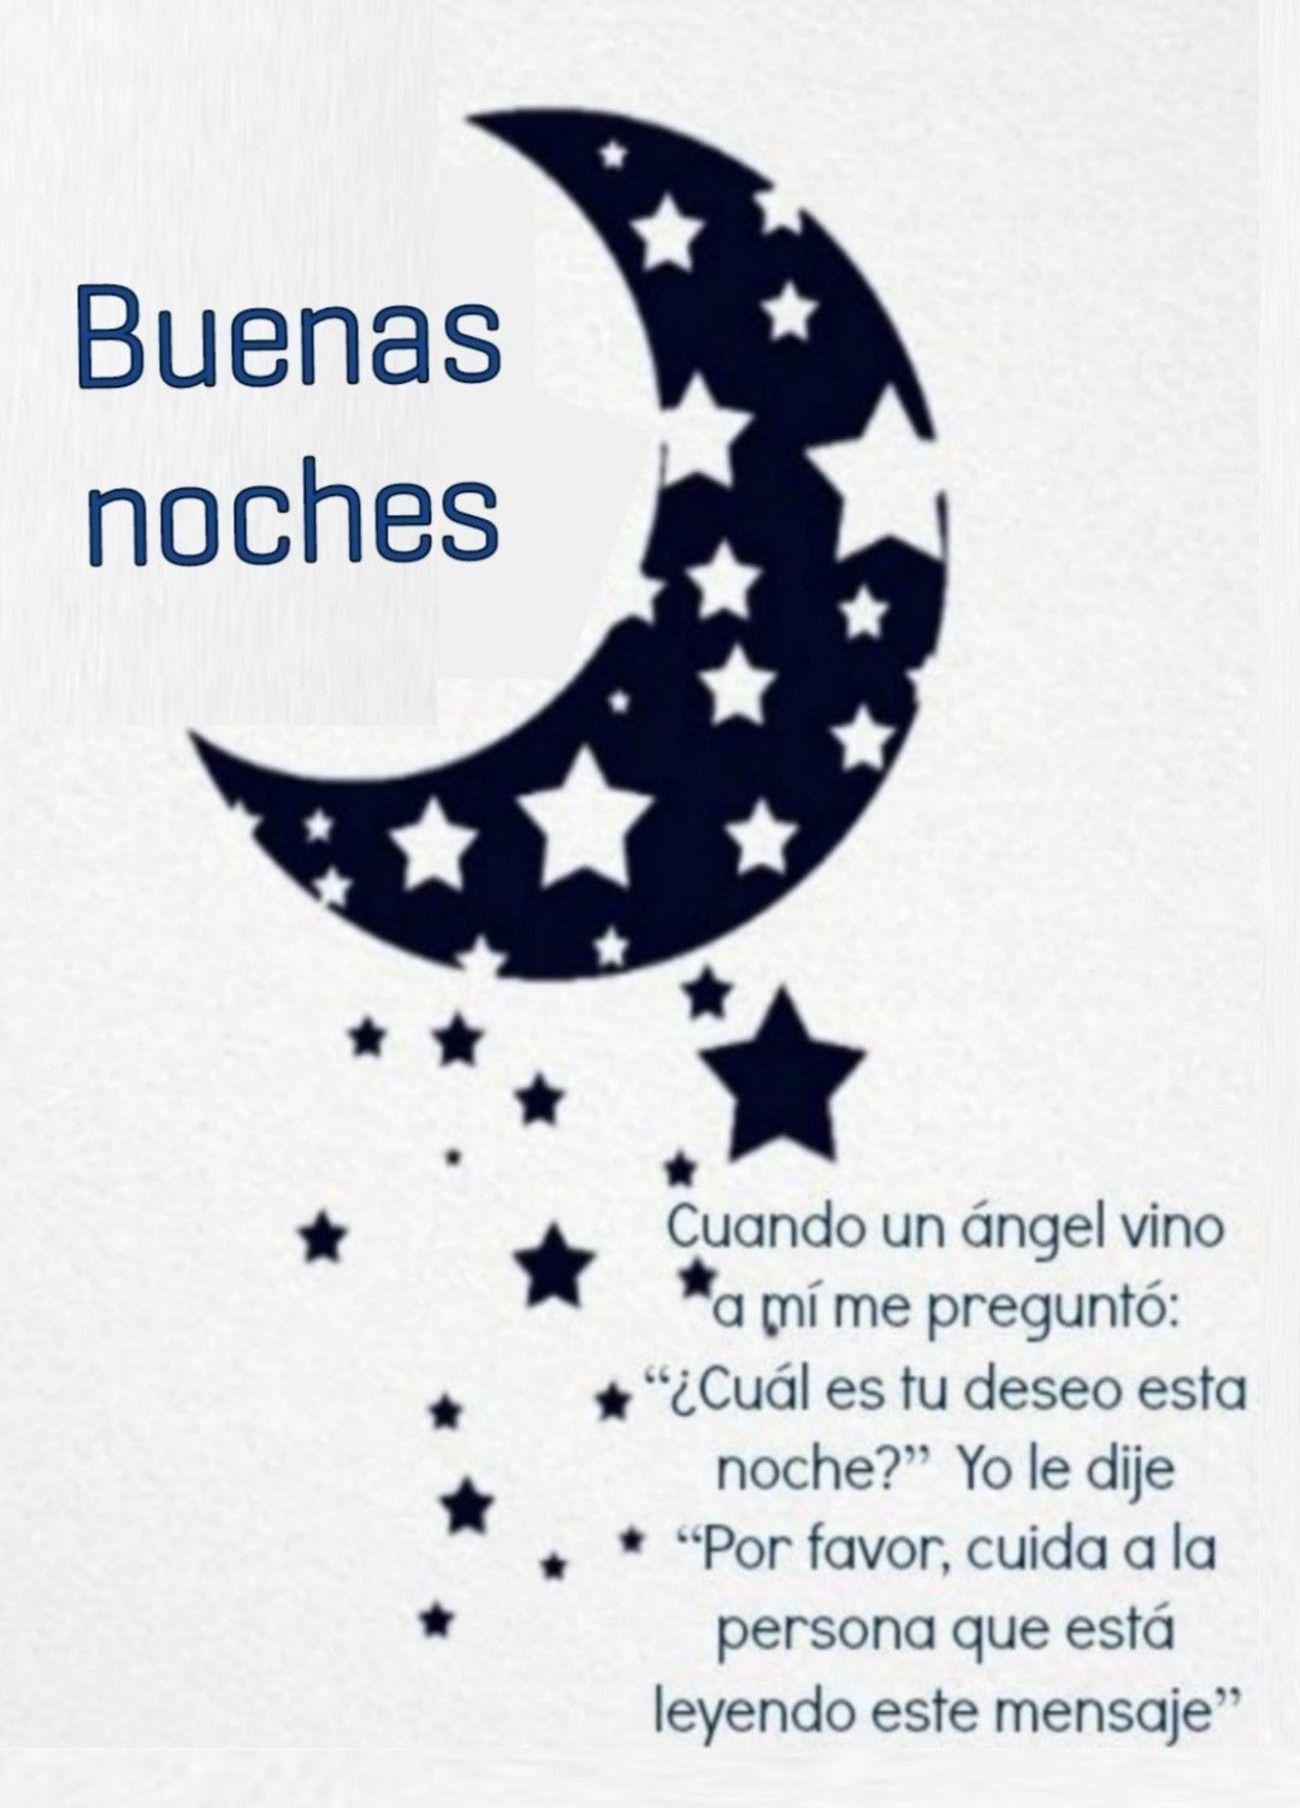 Pin De Nati Lopez En Ex Amor Postales De Buenas Noches Buenas Noches Frases Imagenes De Buenas Noches